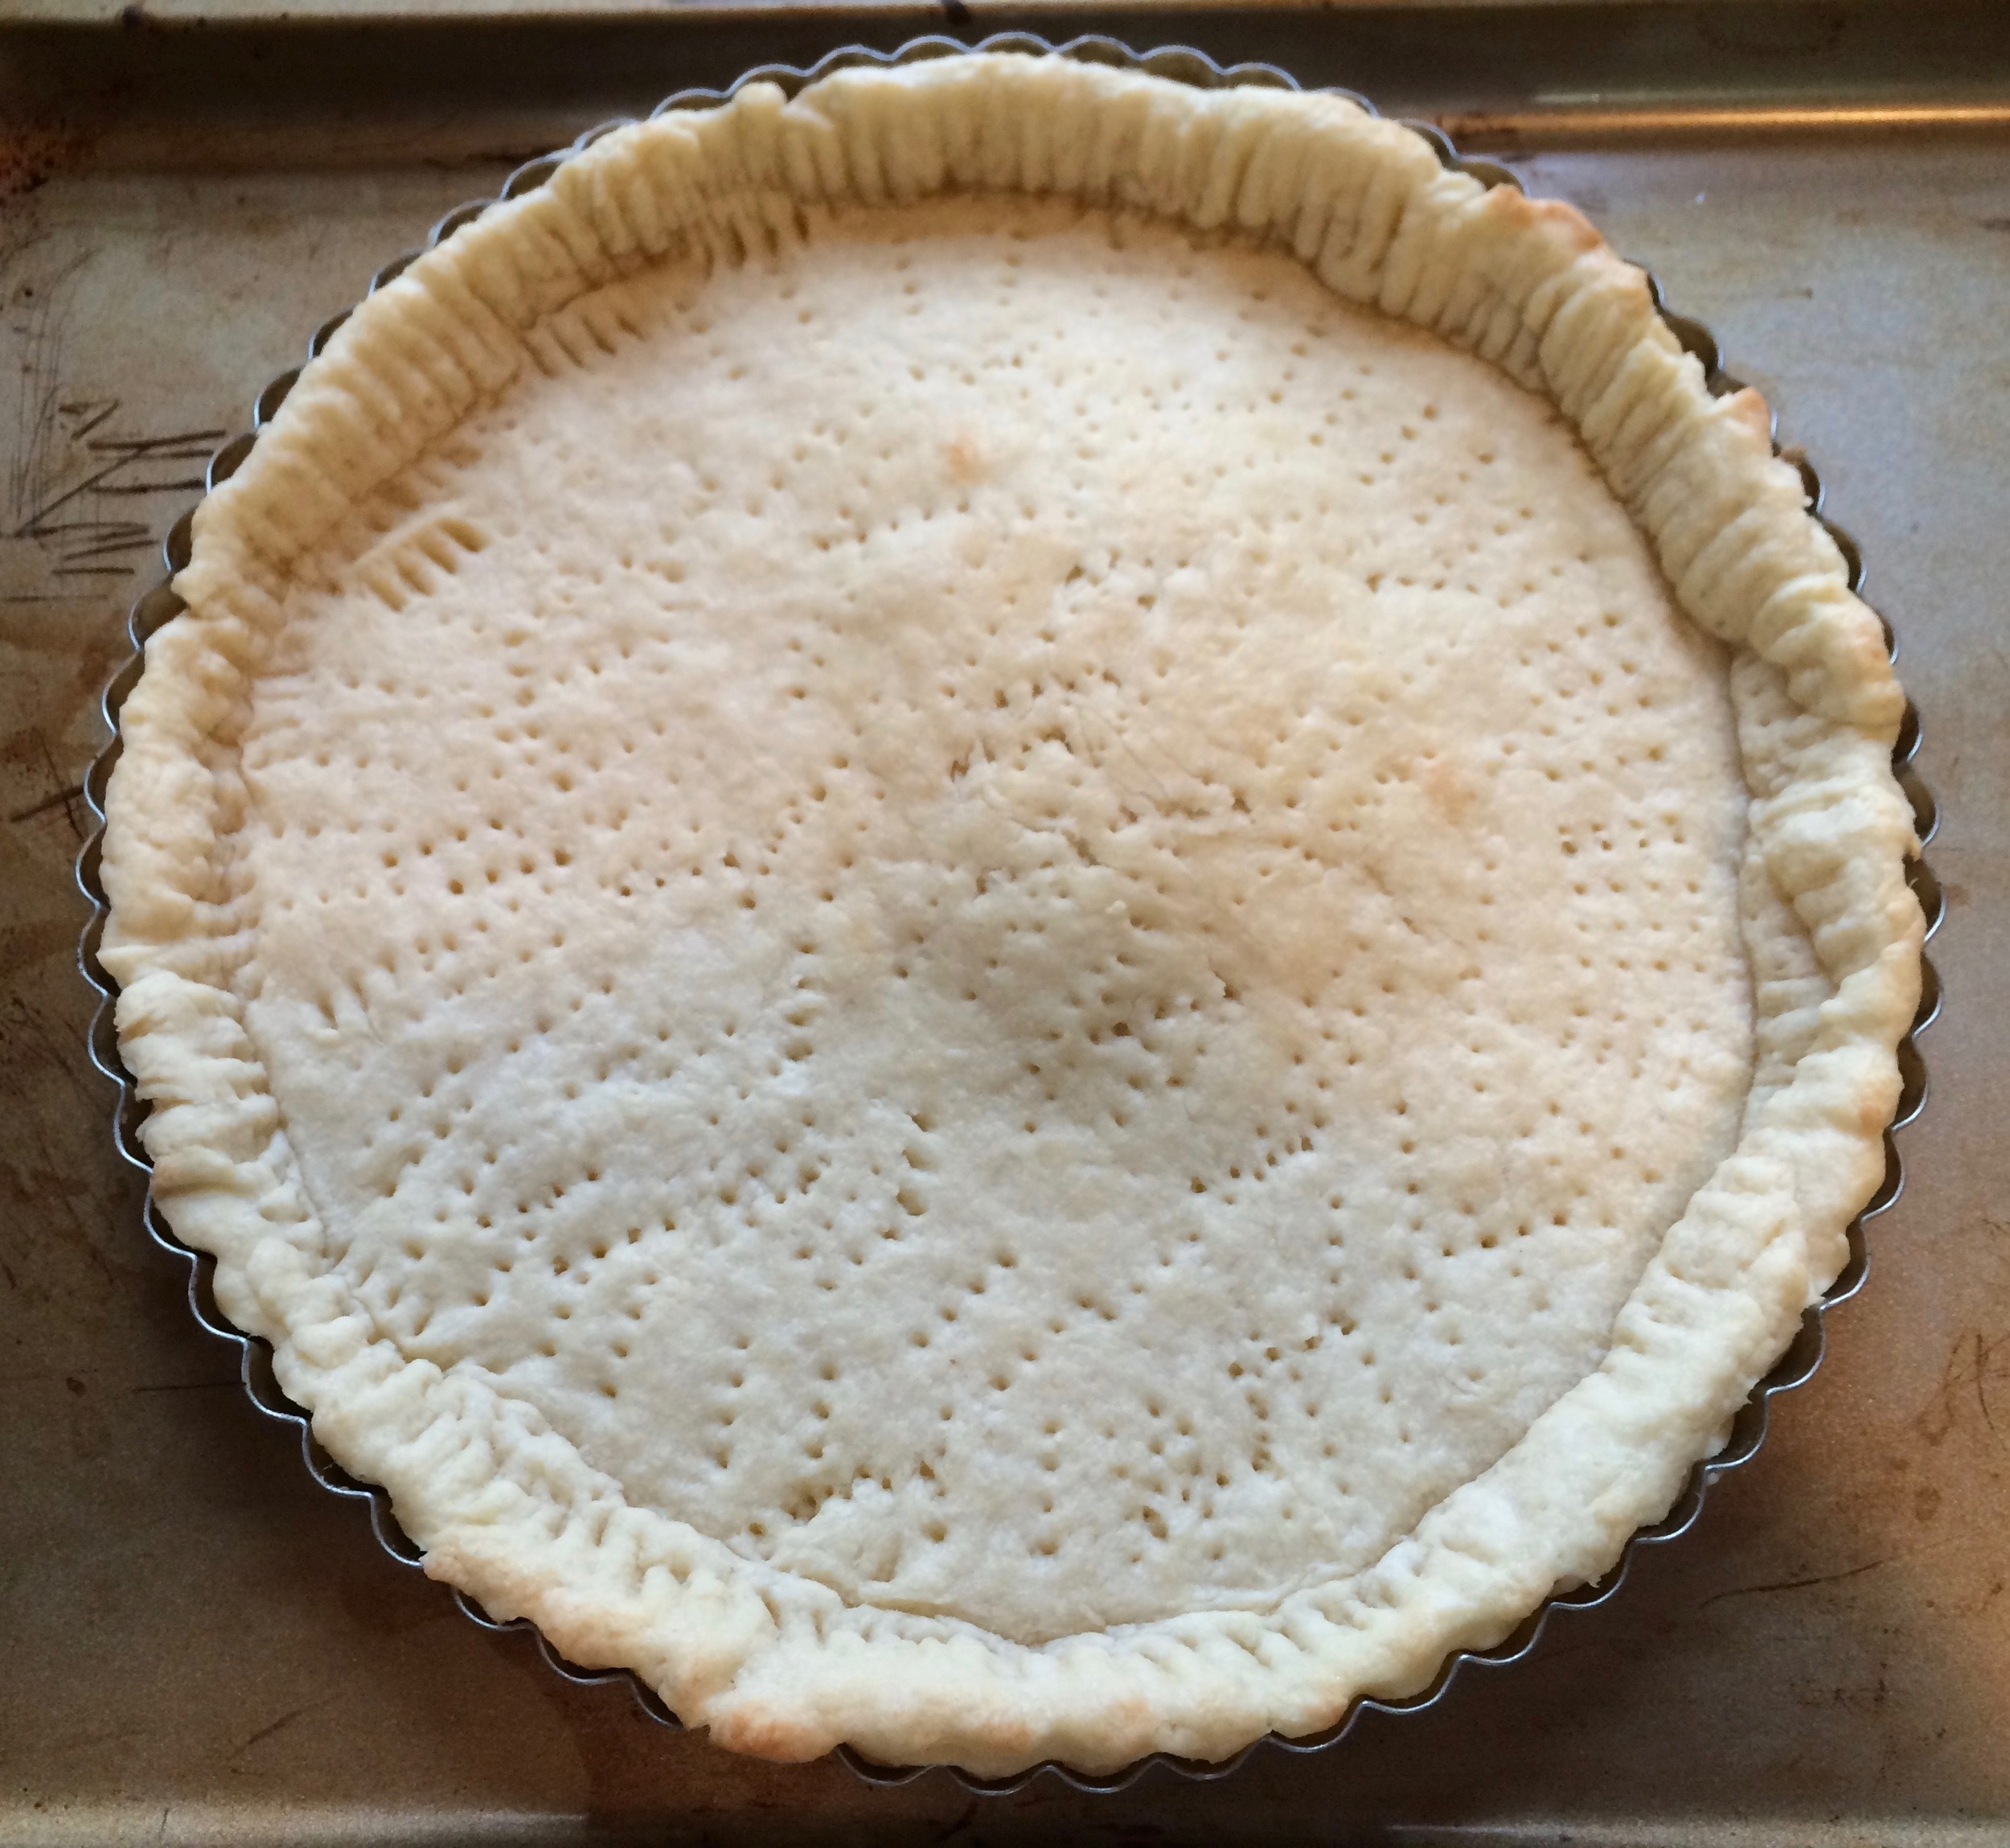 Fully baked shell